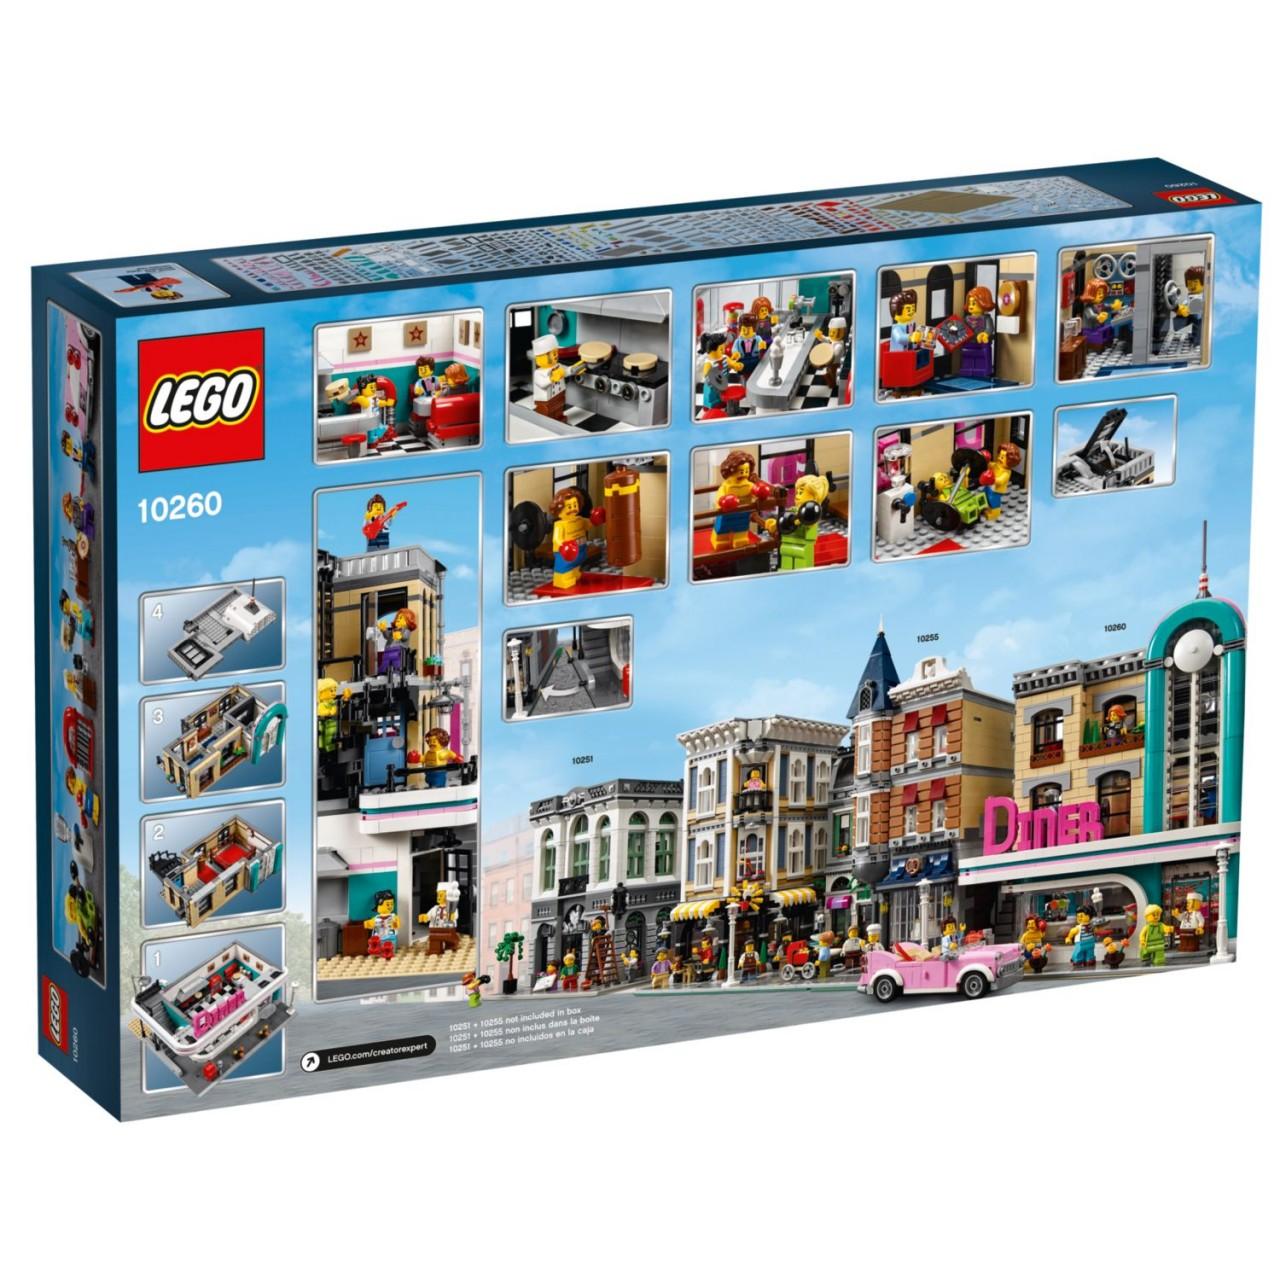 LEGO CREATOR 10260 Amerikanisches Diner